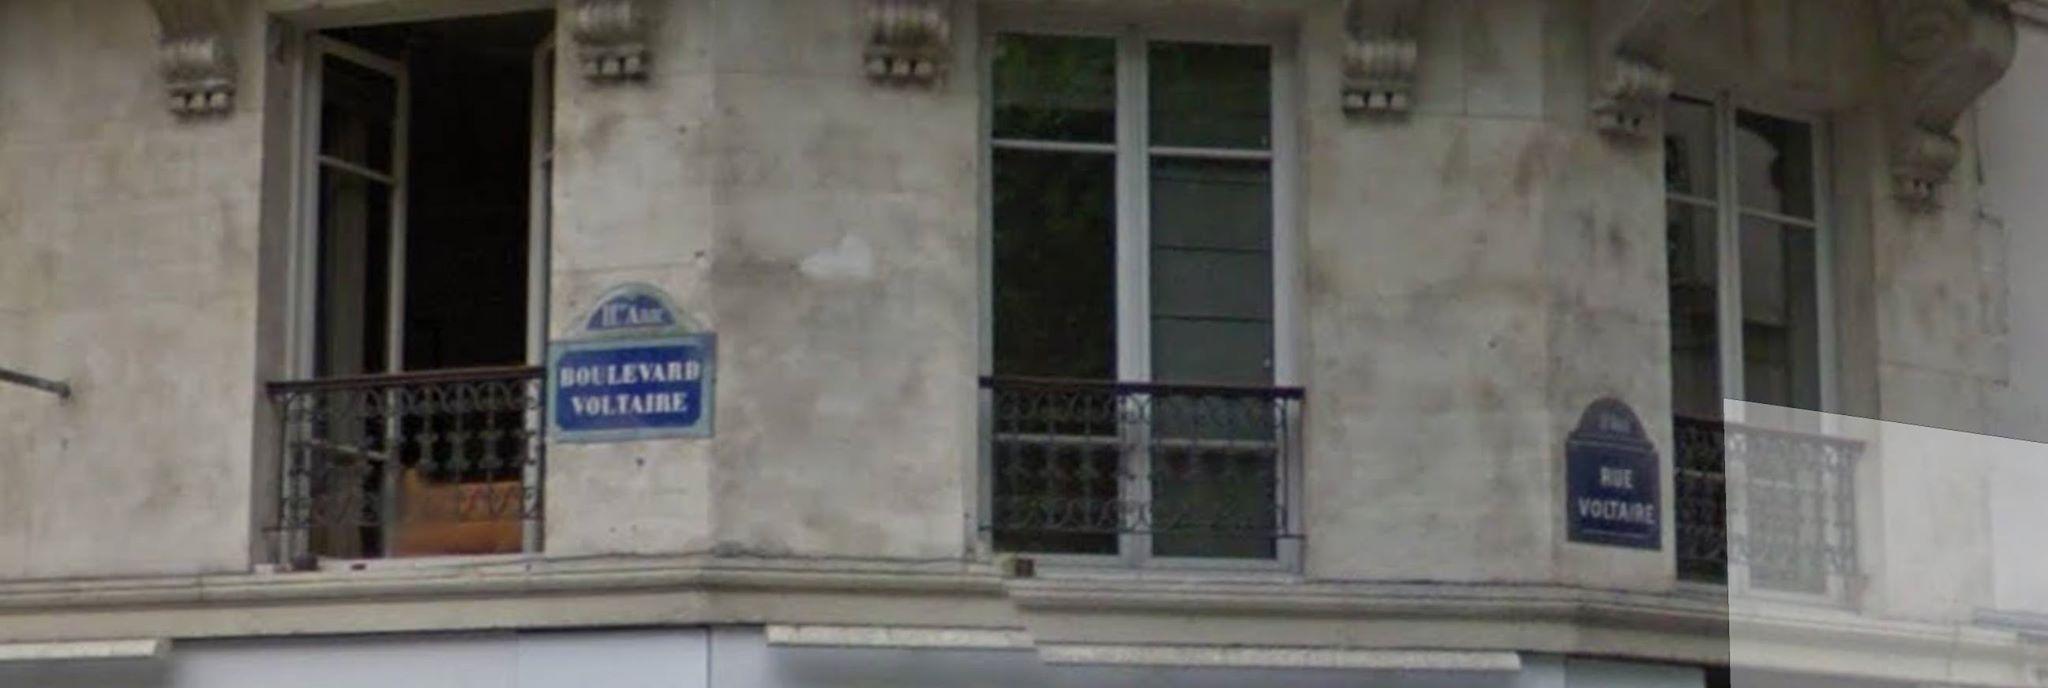 Boulevard Voltaire × Rue Voltaire